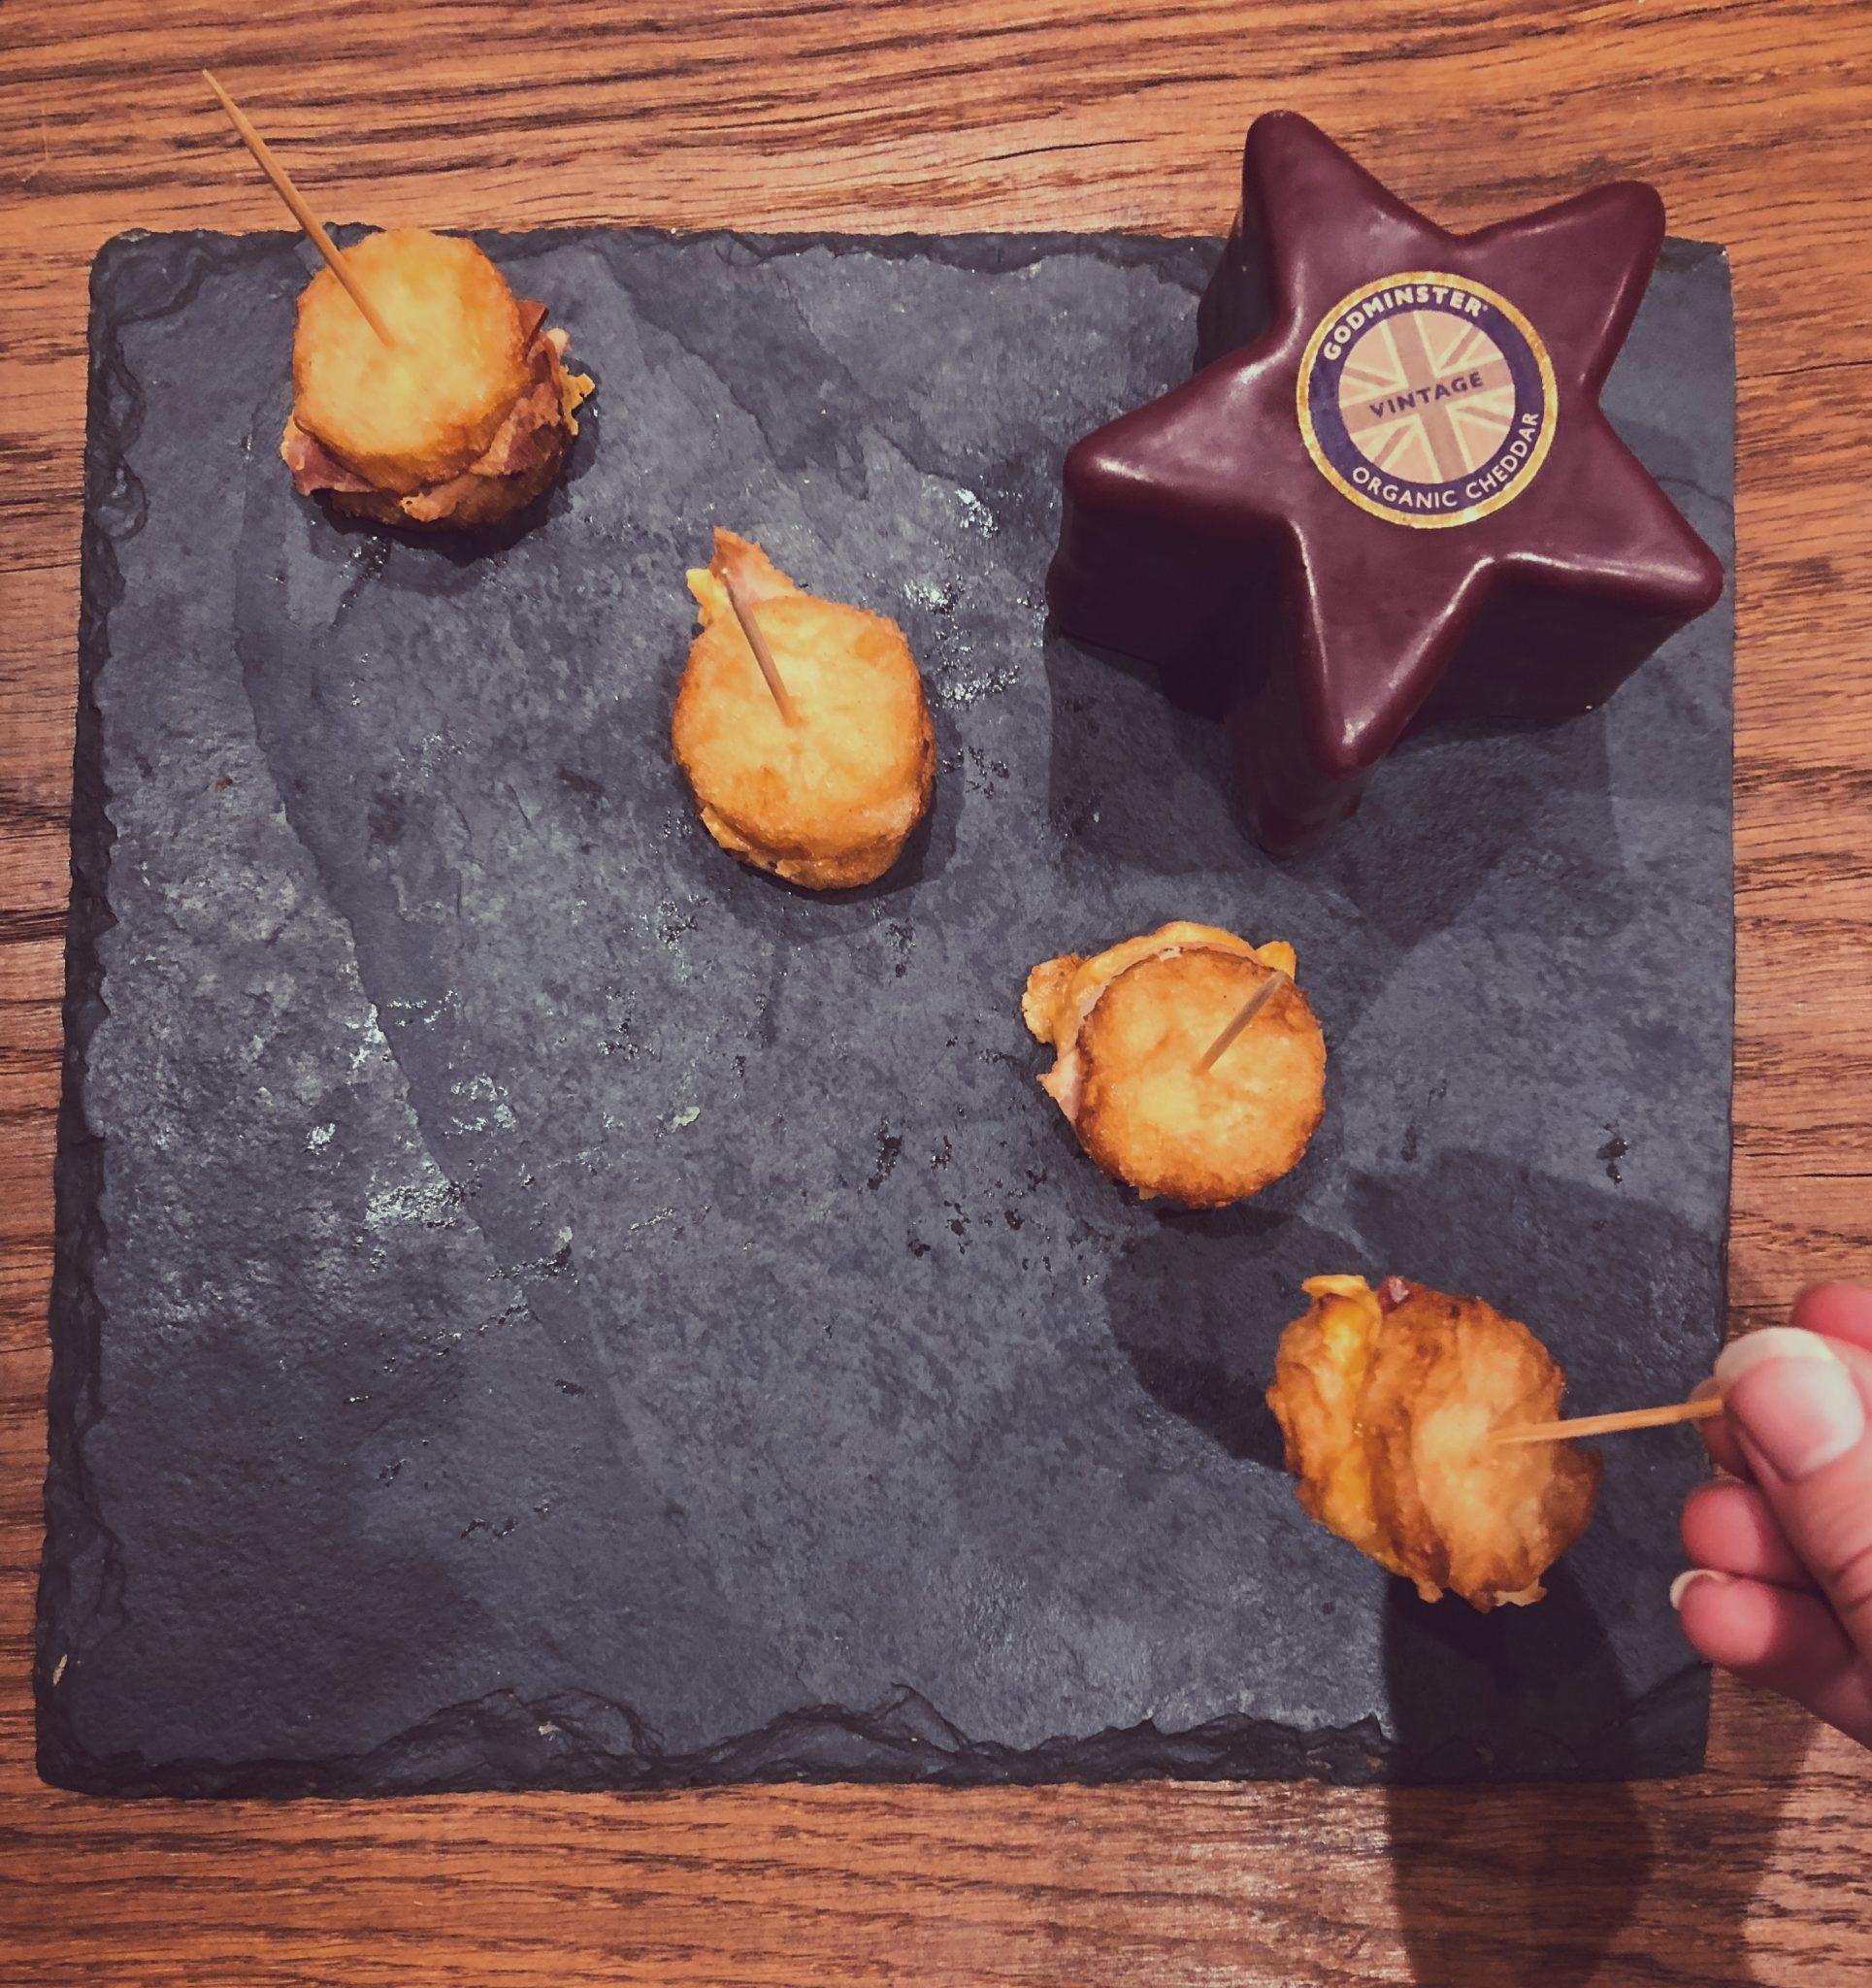 Godminster Potato Rosti Stacks With Cheddar & Bacon